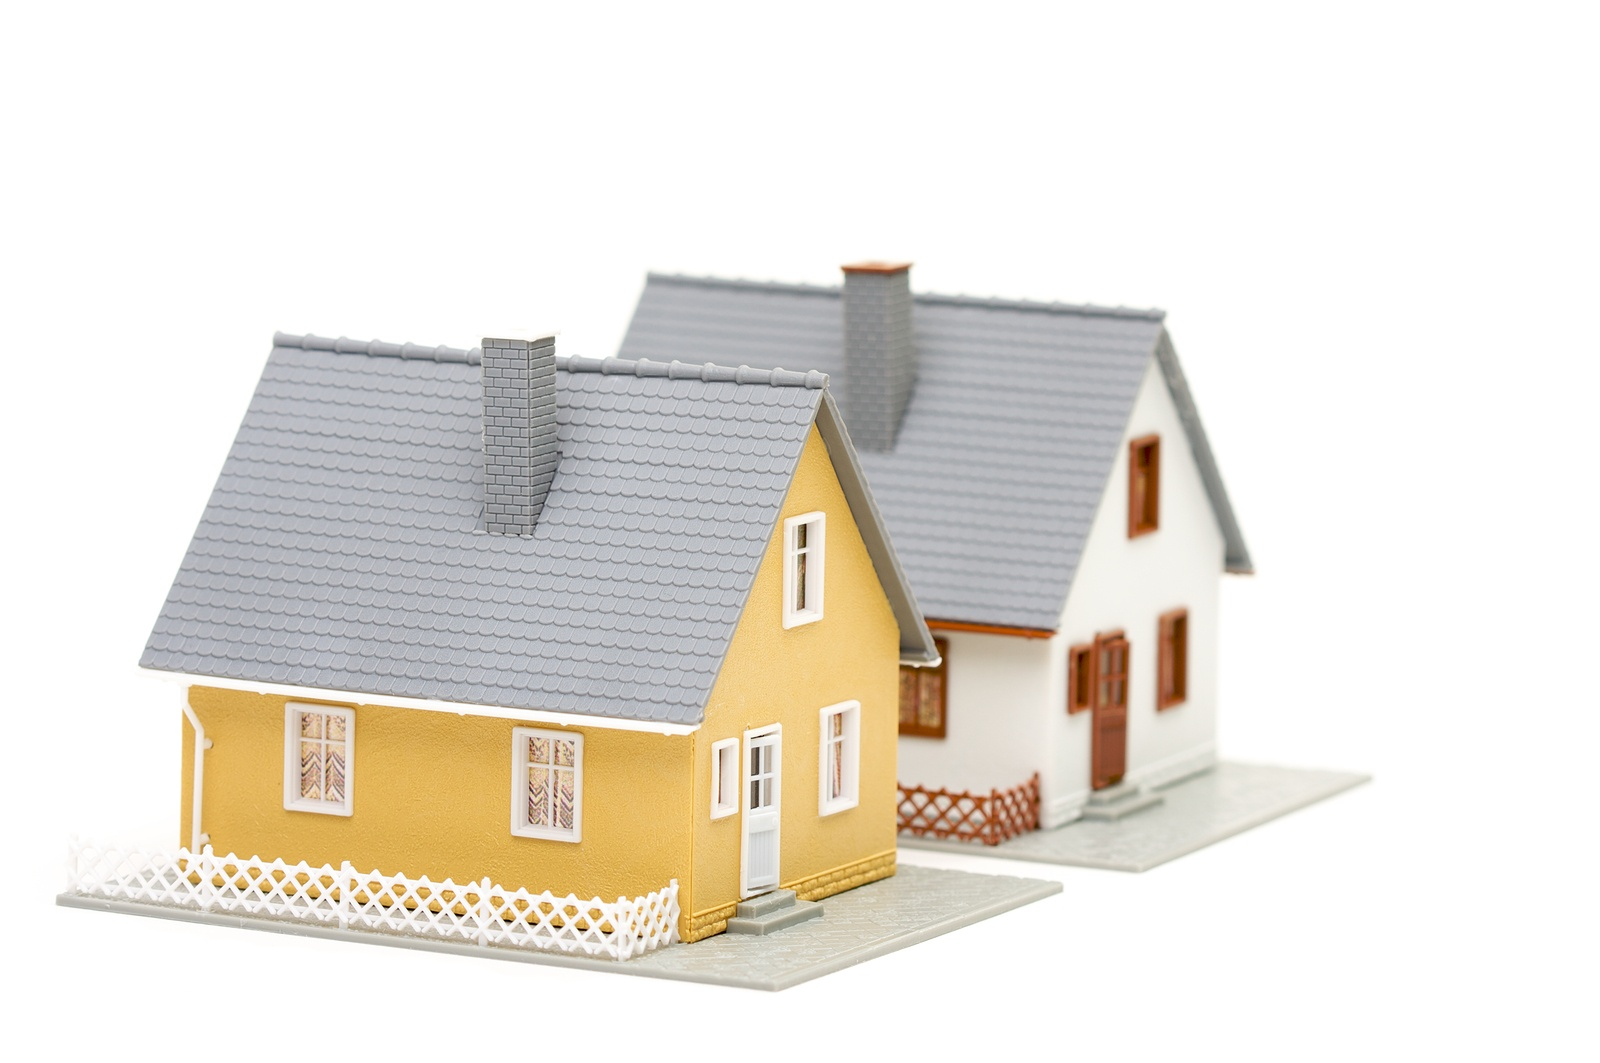 DeKalb_County_Tax_Assessor-10